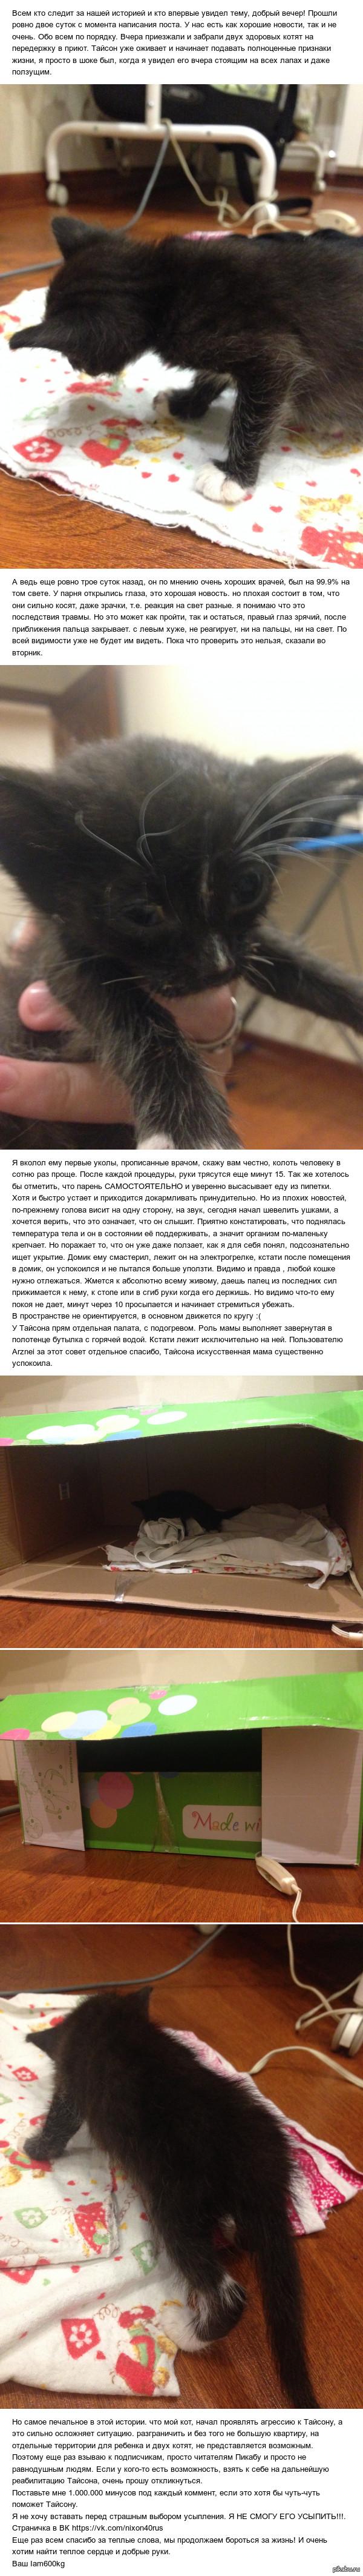 "Маленькая история, маленького бойца (Часть 2) Продолжение поста <a href=""http://pikabu.ru/story/malenkaya_istoriya_malenkogo_boytsa_3621930"">http://pikabu.ru/story/_3621930</a>"